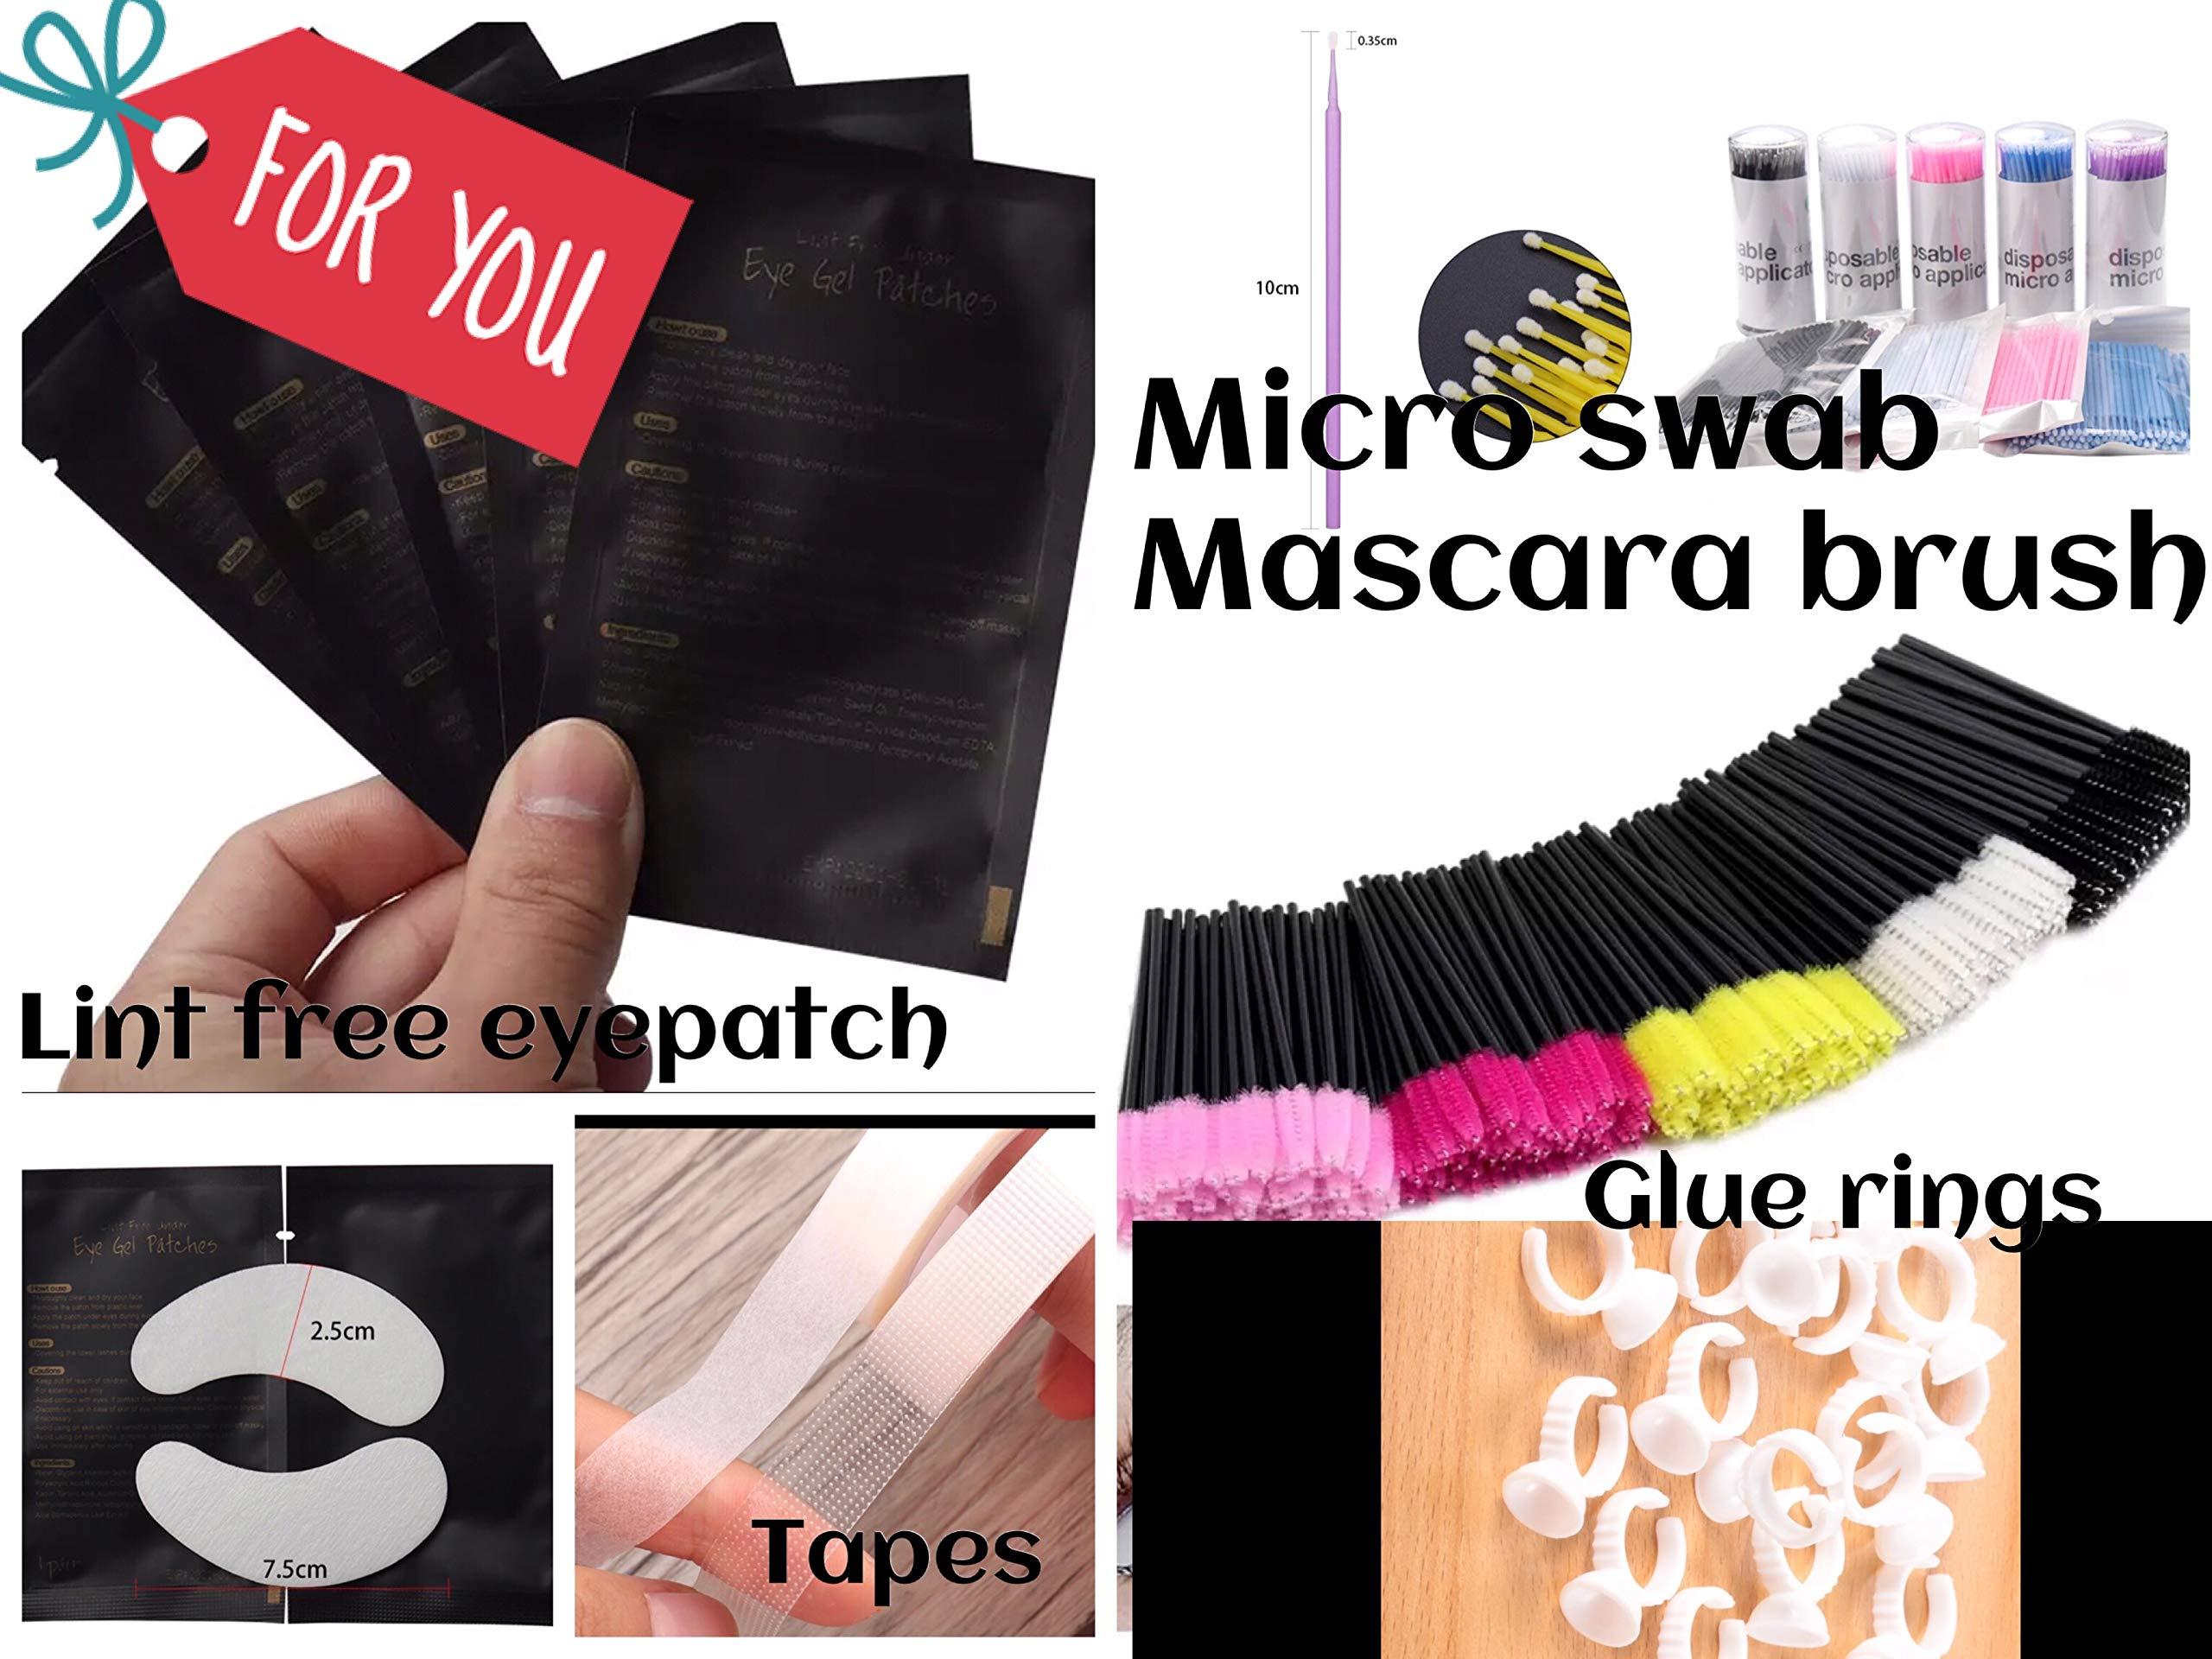 4X100 Eyelash Extension eye pads Lint free Under Eye Gel Pads+100 Disposable Mascara Brushes Wands Applicators +100 Micro Applicator Brush+100 Glue Rings+1 Medical+1Micro pore tape